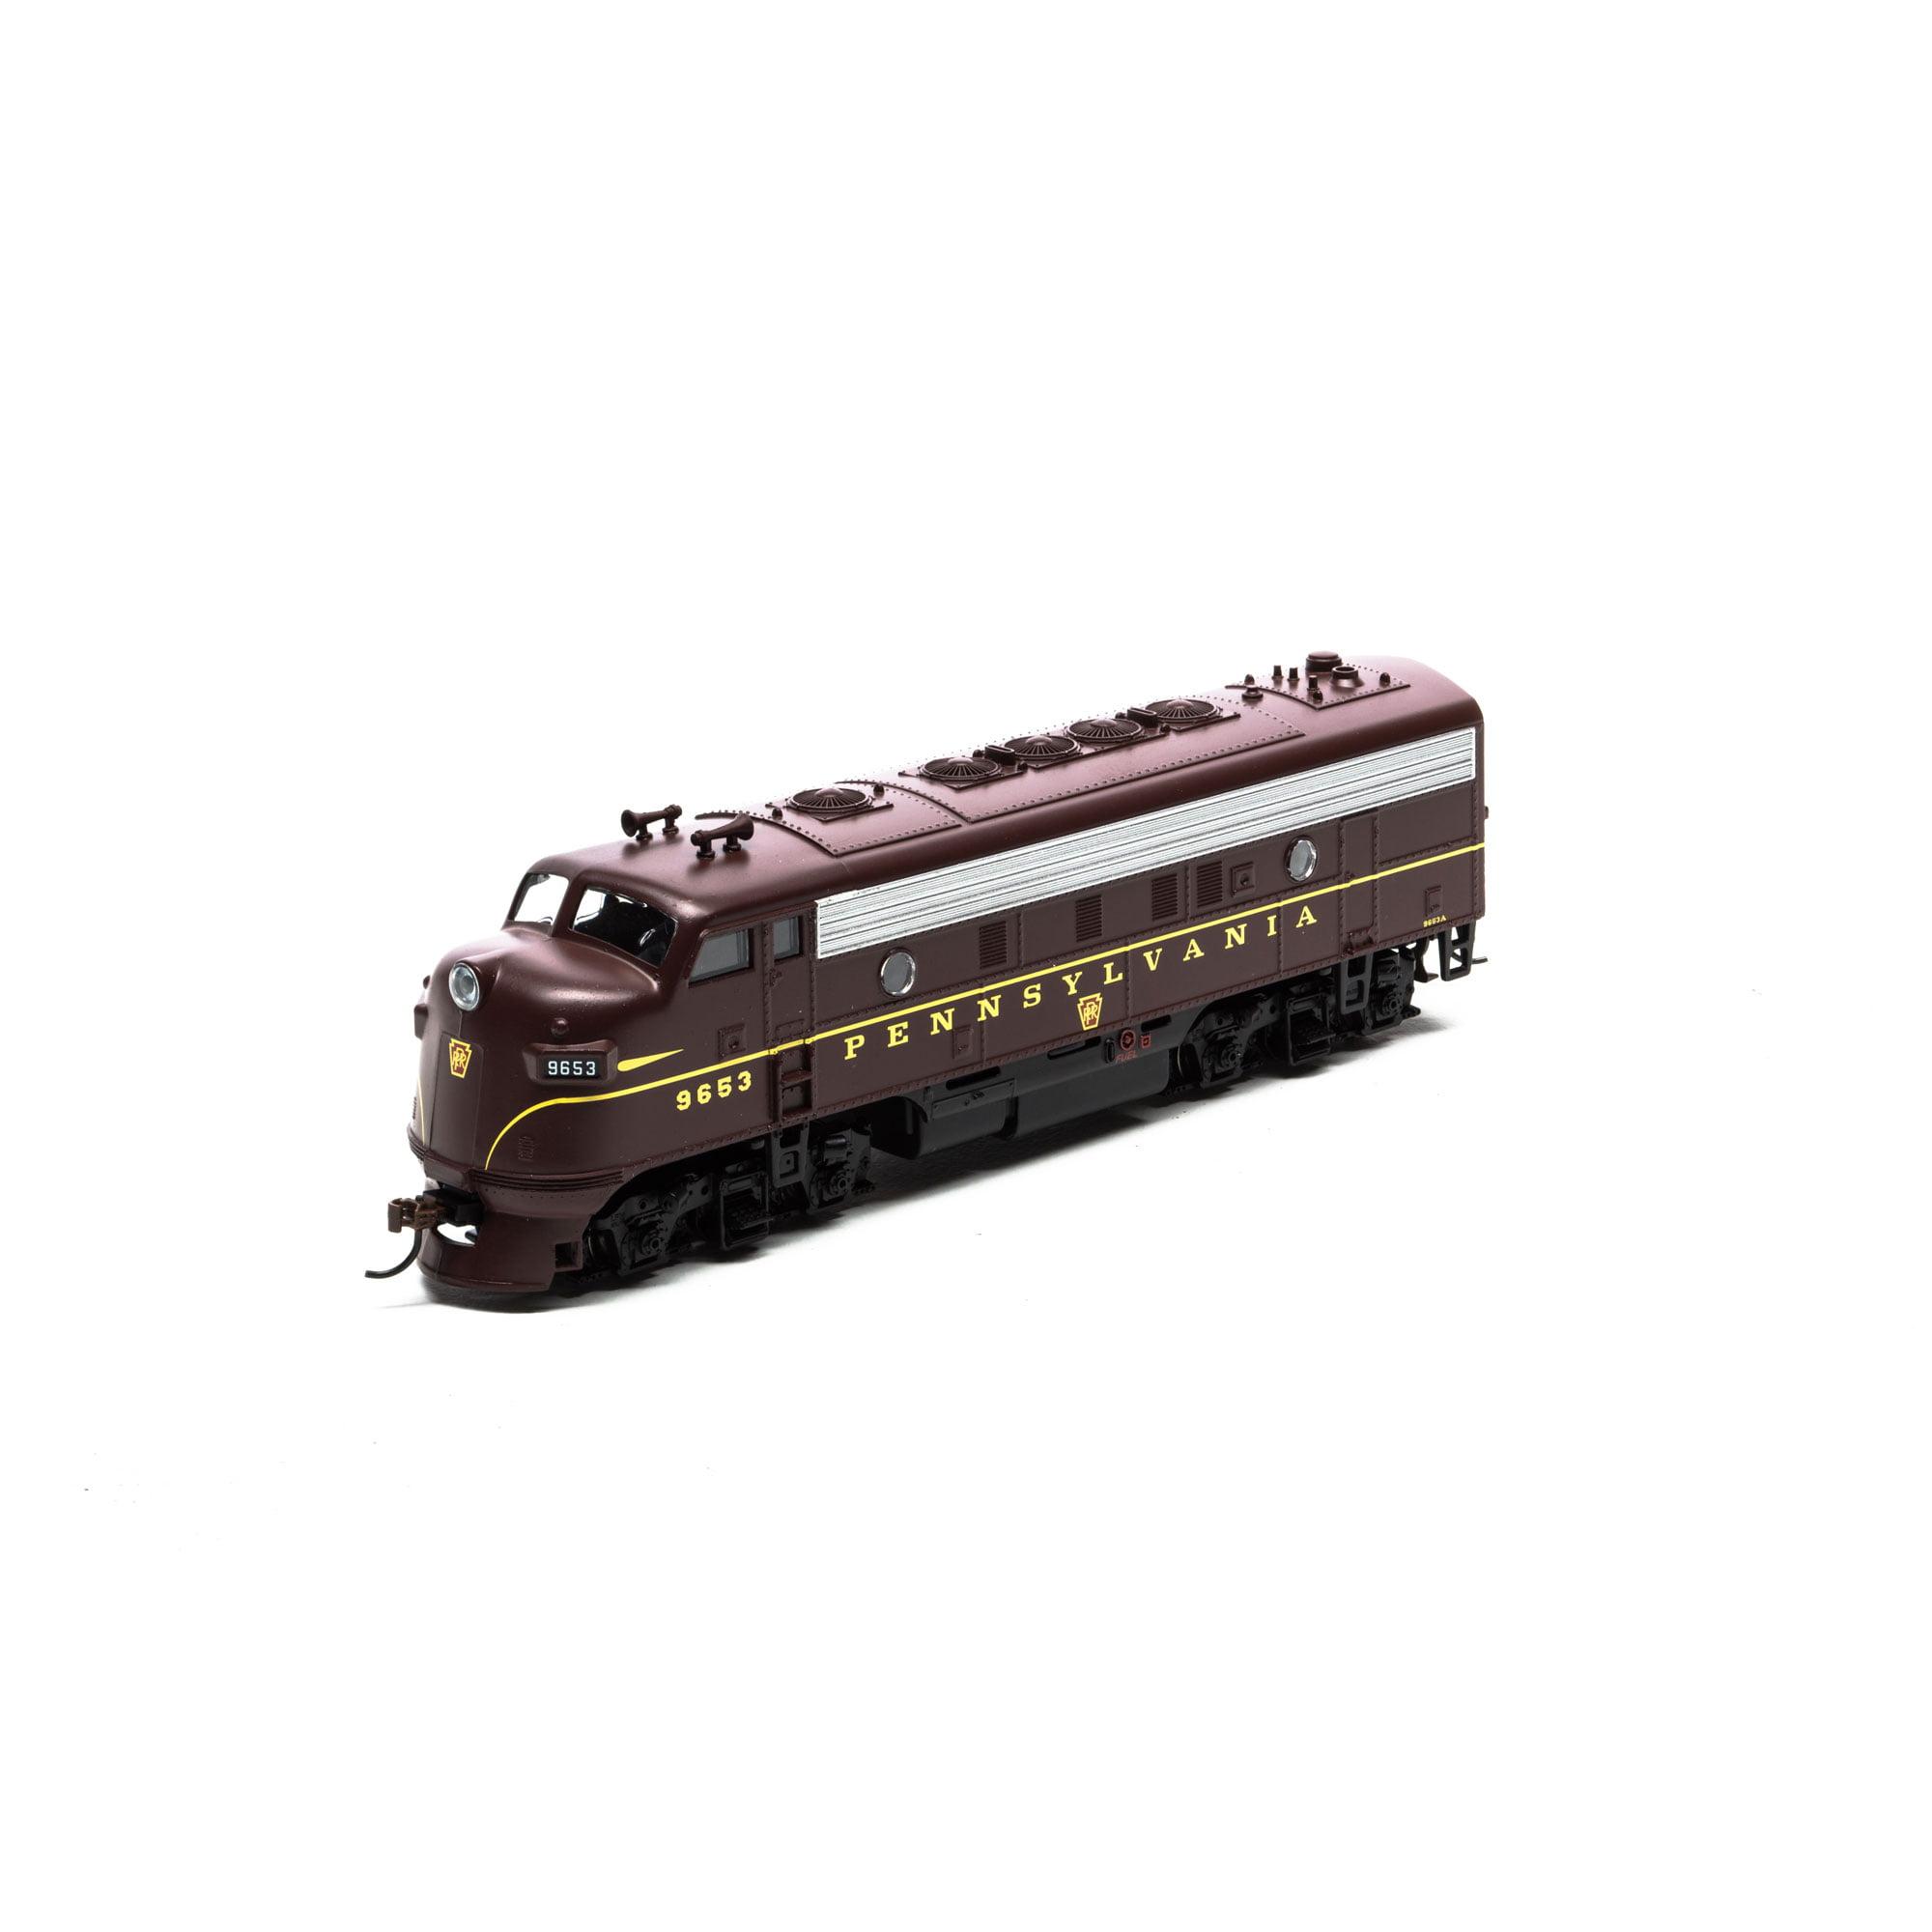 Roundhouse 14782 HO Pennsylvania F7A Diesel Locomotive #9653